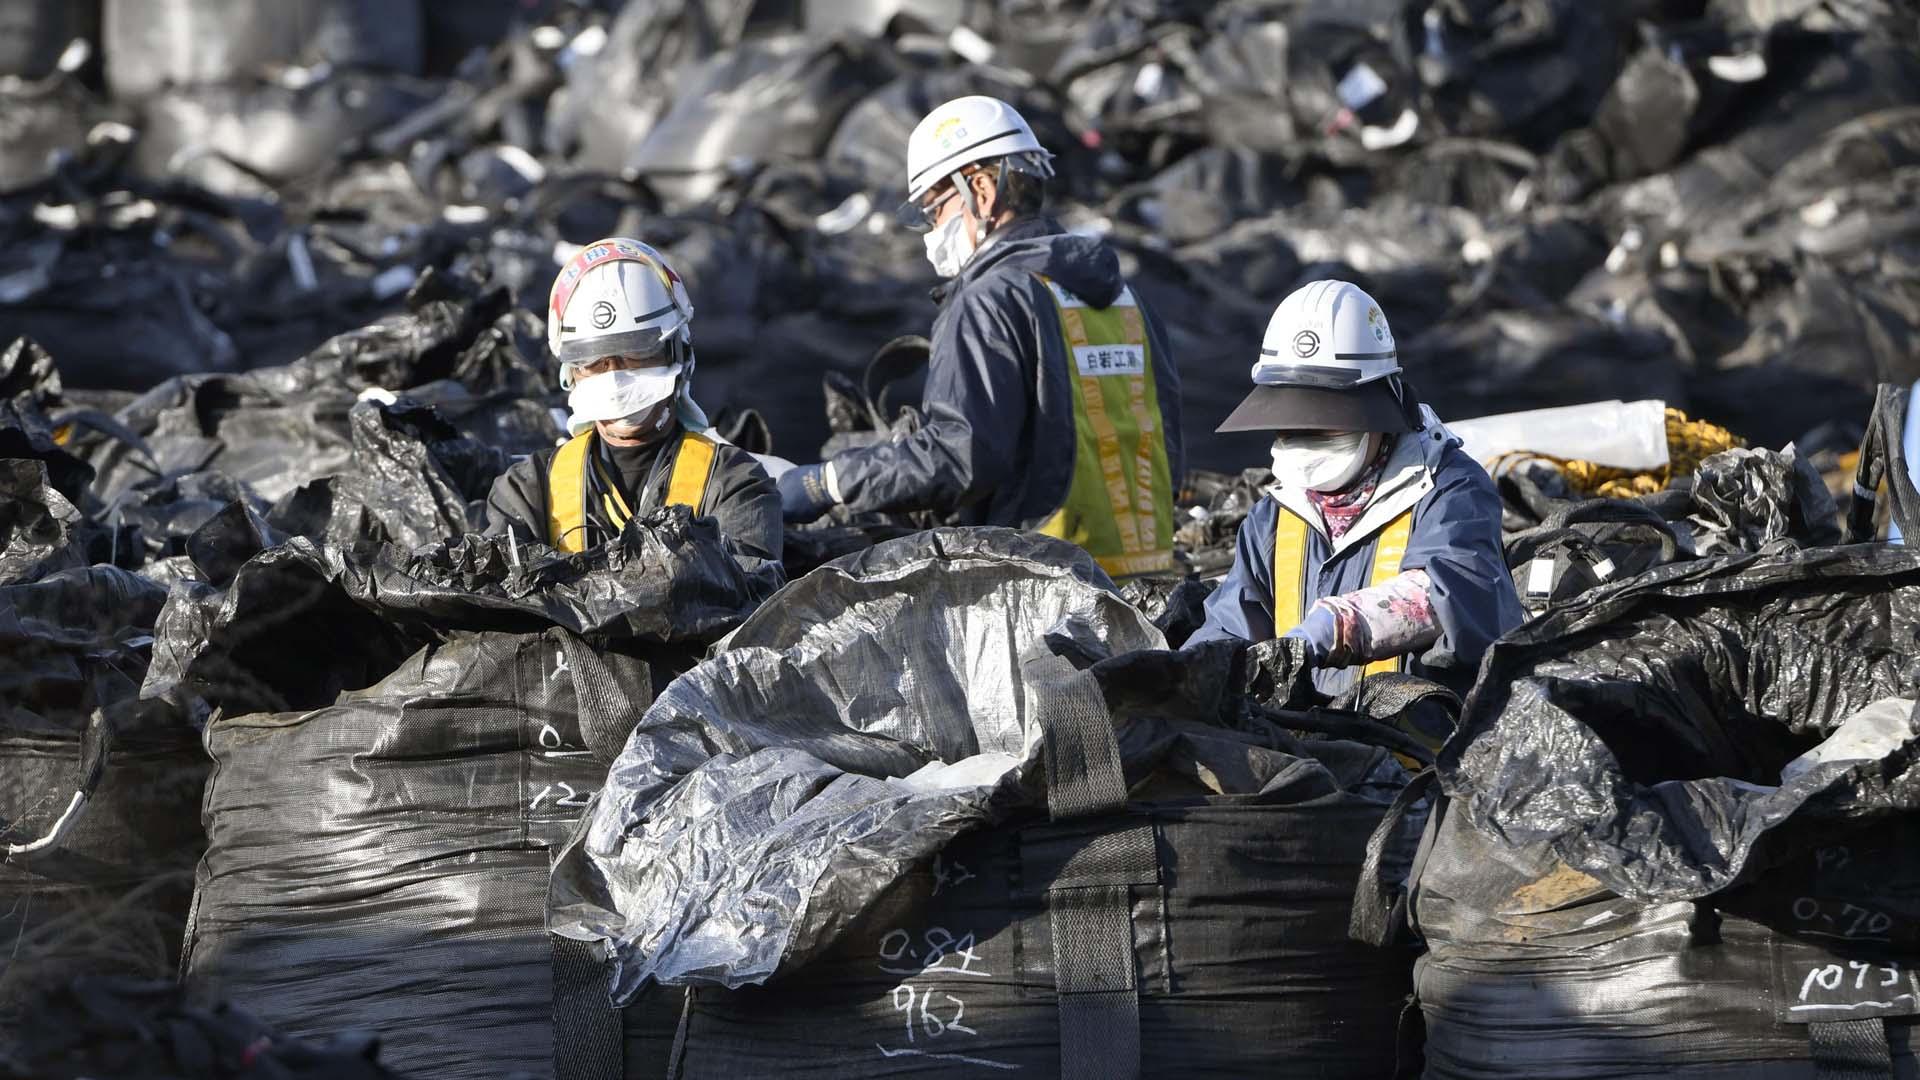 日 방사성폐기물 또 유출…폐기물 자루 빈 채로 발견